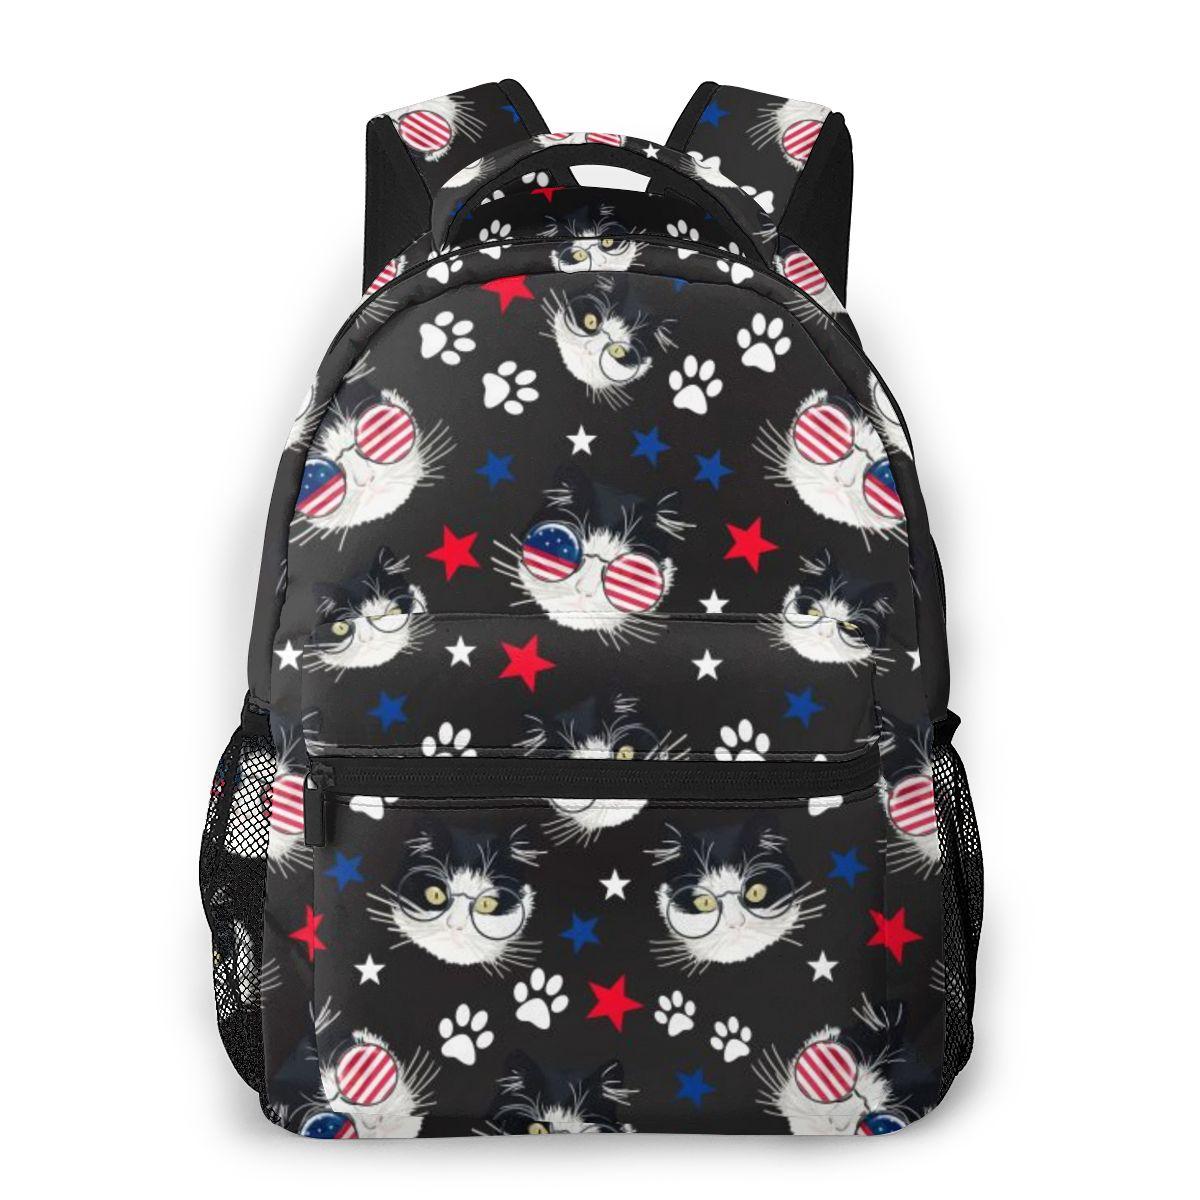 Mochila para mujer, mochila escolar para chicas adolescentes, Gato Hipster con bandera americana, gafas de sol para mujer, mochila para ordenador portátil, mochila de viaje 2020